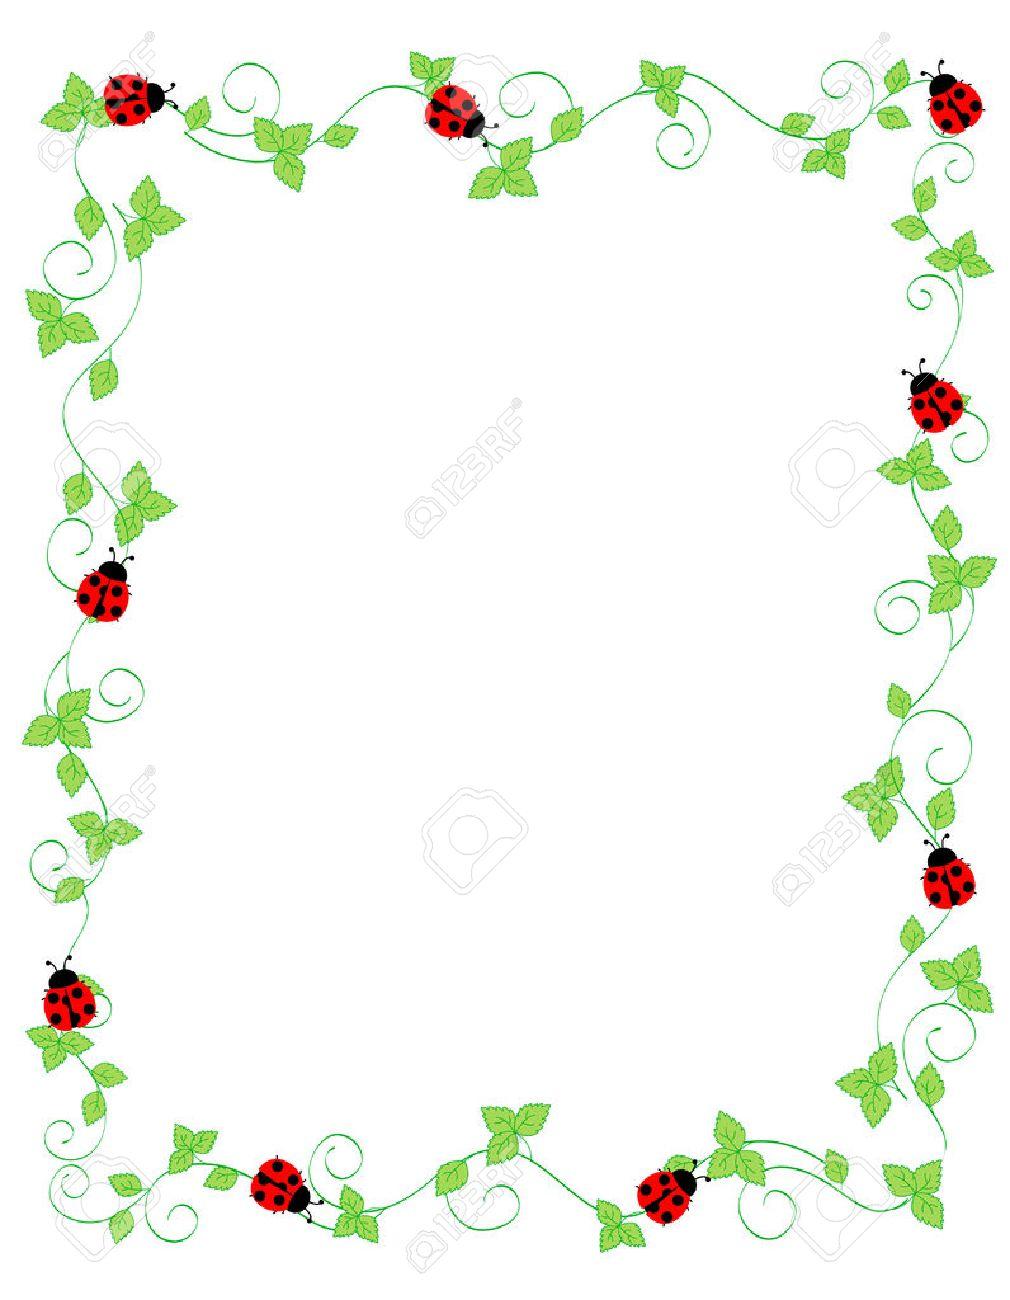 Cute Ladybugs On Green Ivy Frame Border Isolated On White